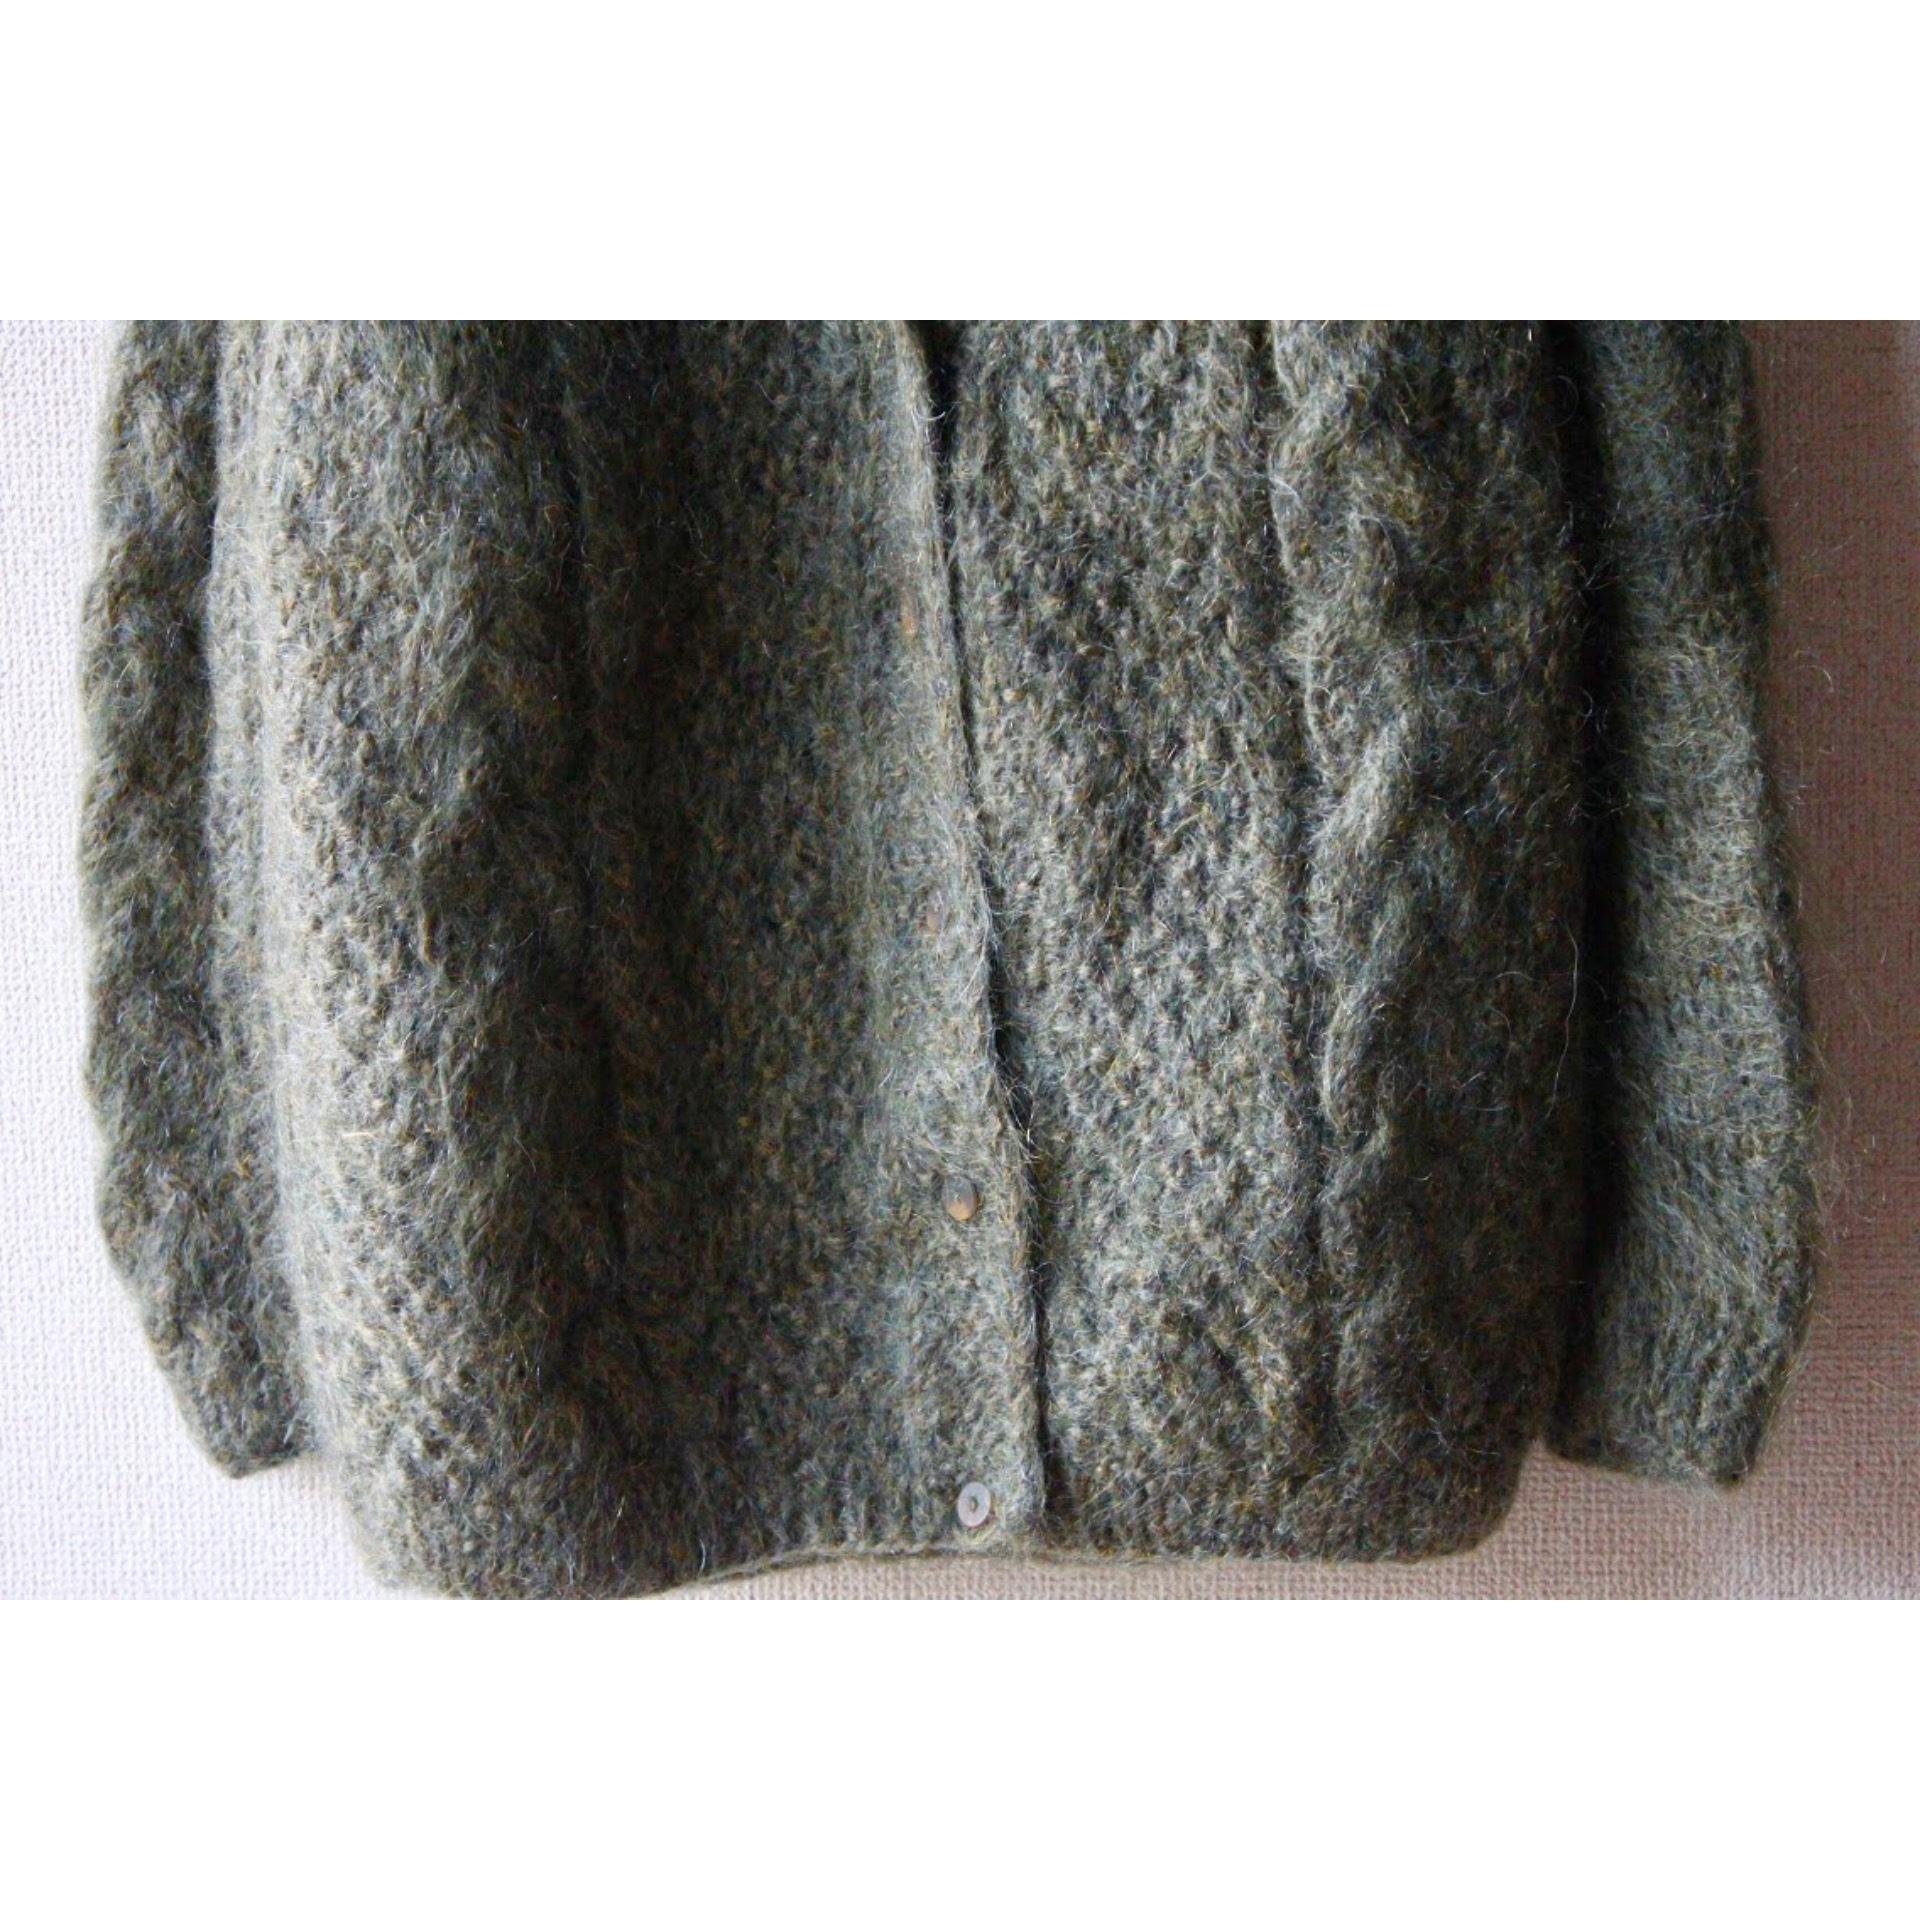 Vintage hand knit cardigan